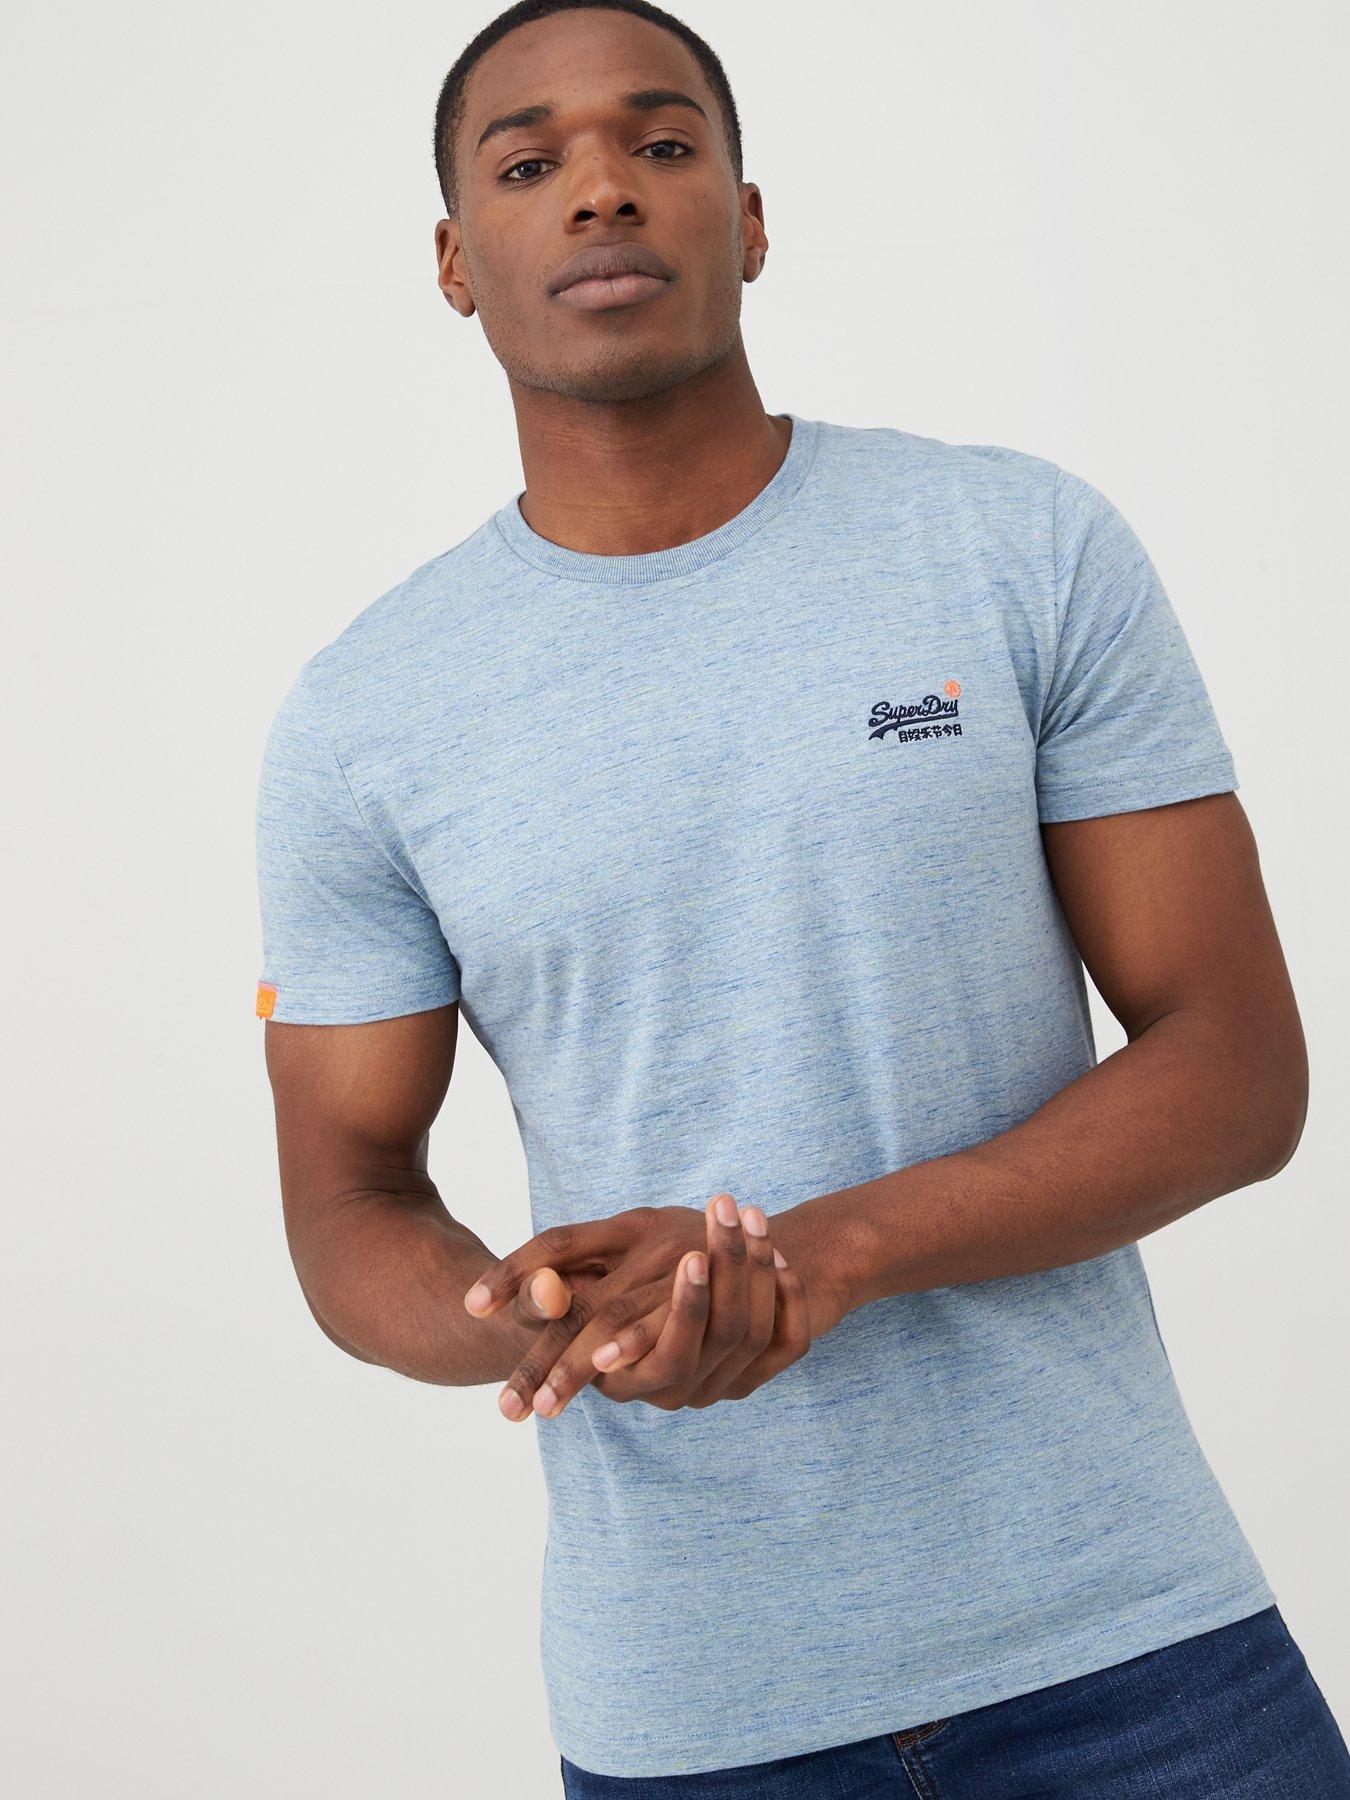 MENS /'PIG t.shirt in Marl grey Sizes M-XXL